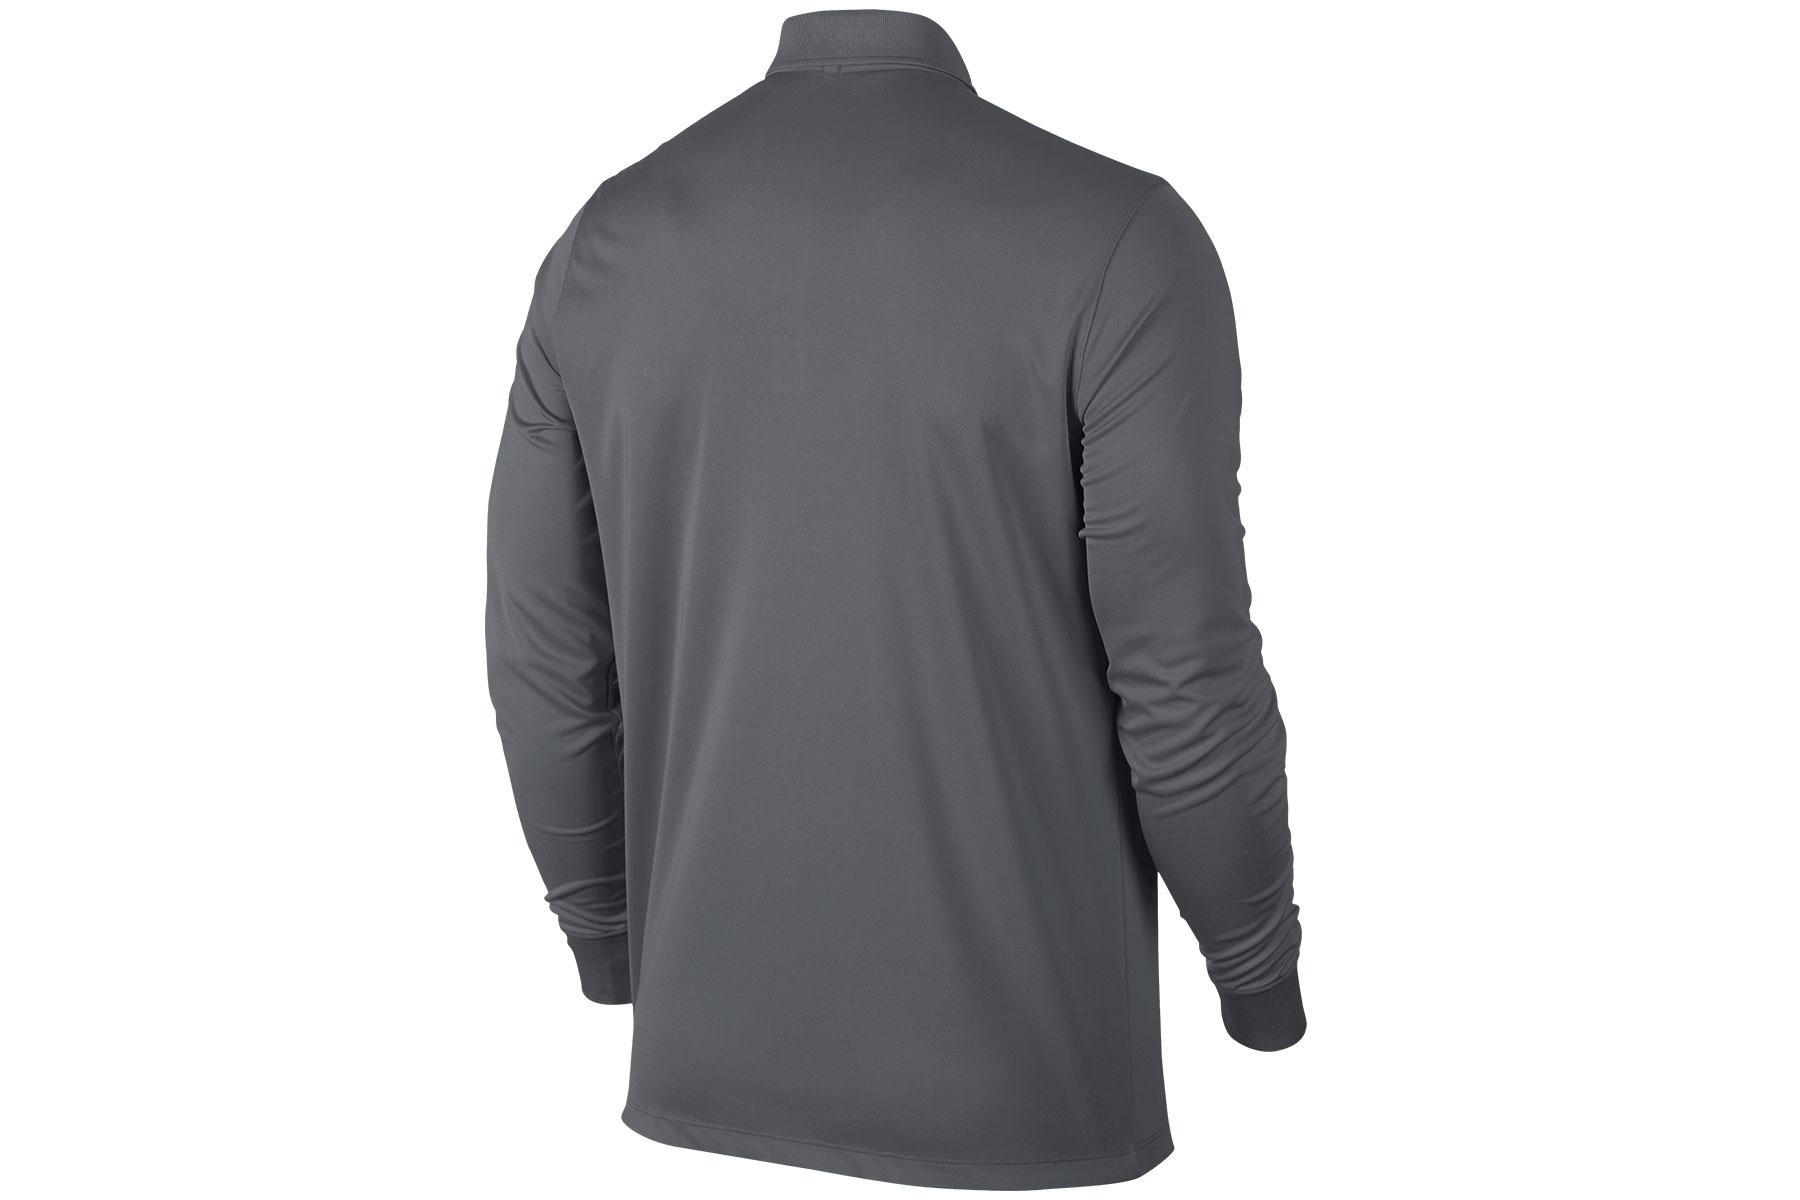 Nike golf victory long sleeve polo shirt online golf for Nike golf victory polo shirt